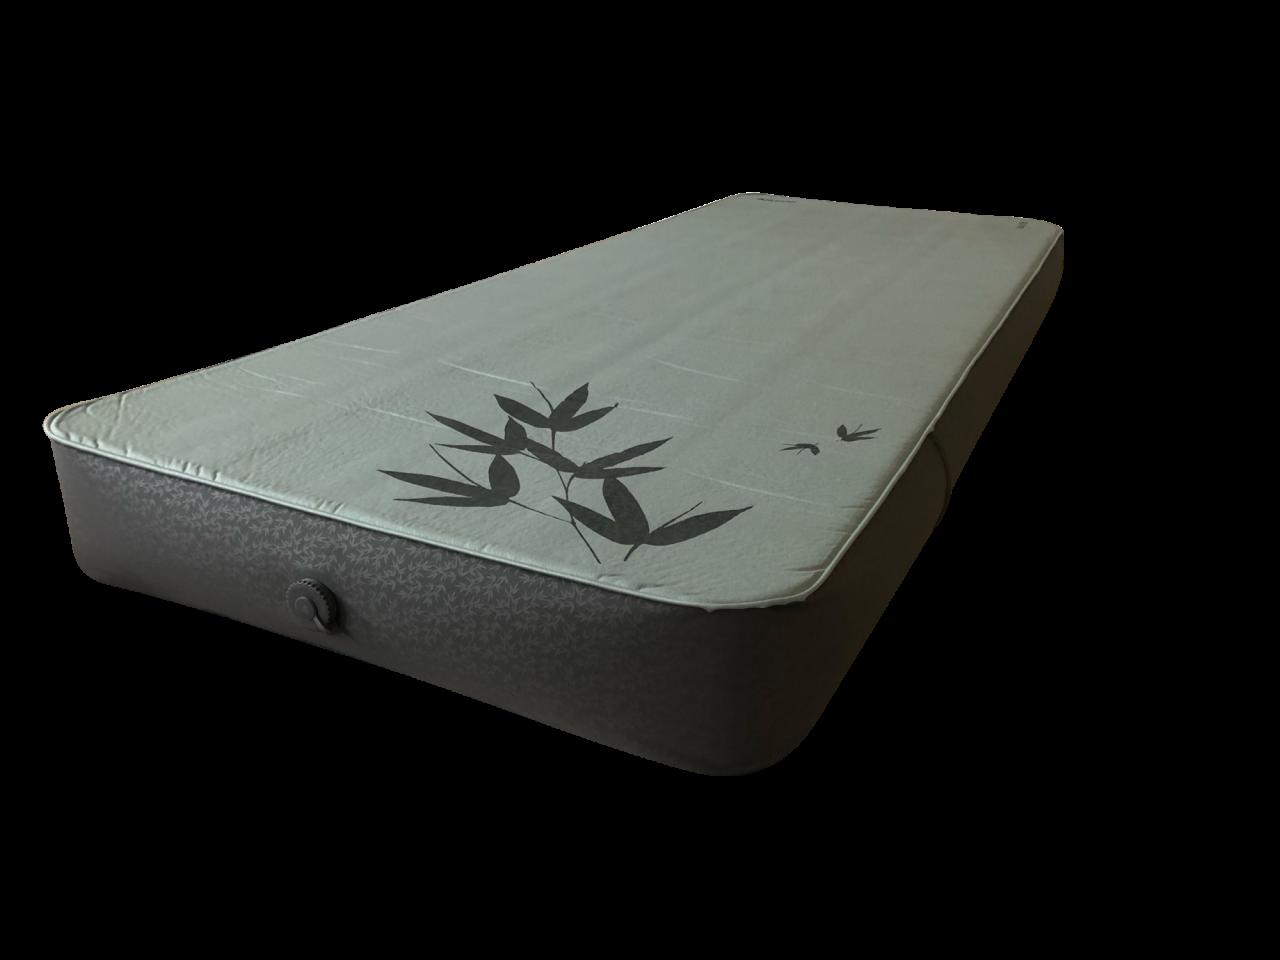 Human Comfort Valette Compact 15 EW Slaapmat